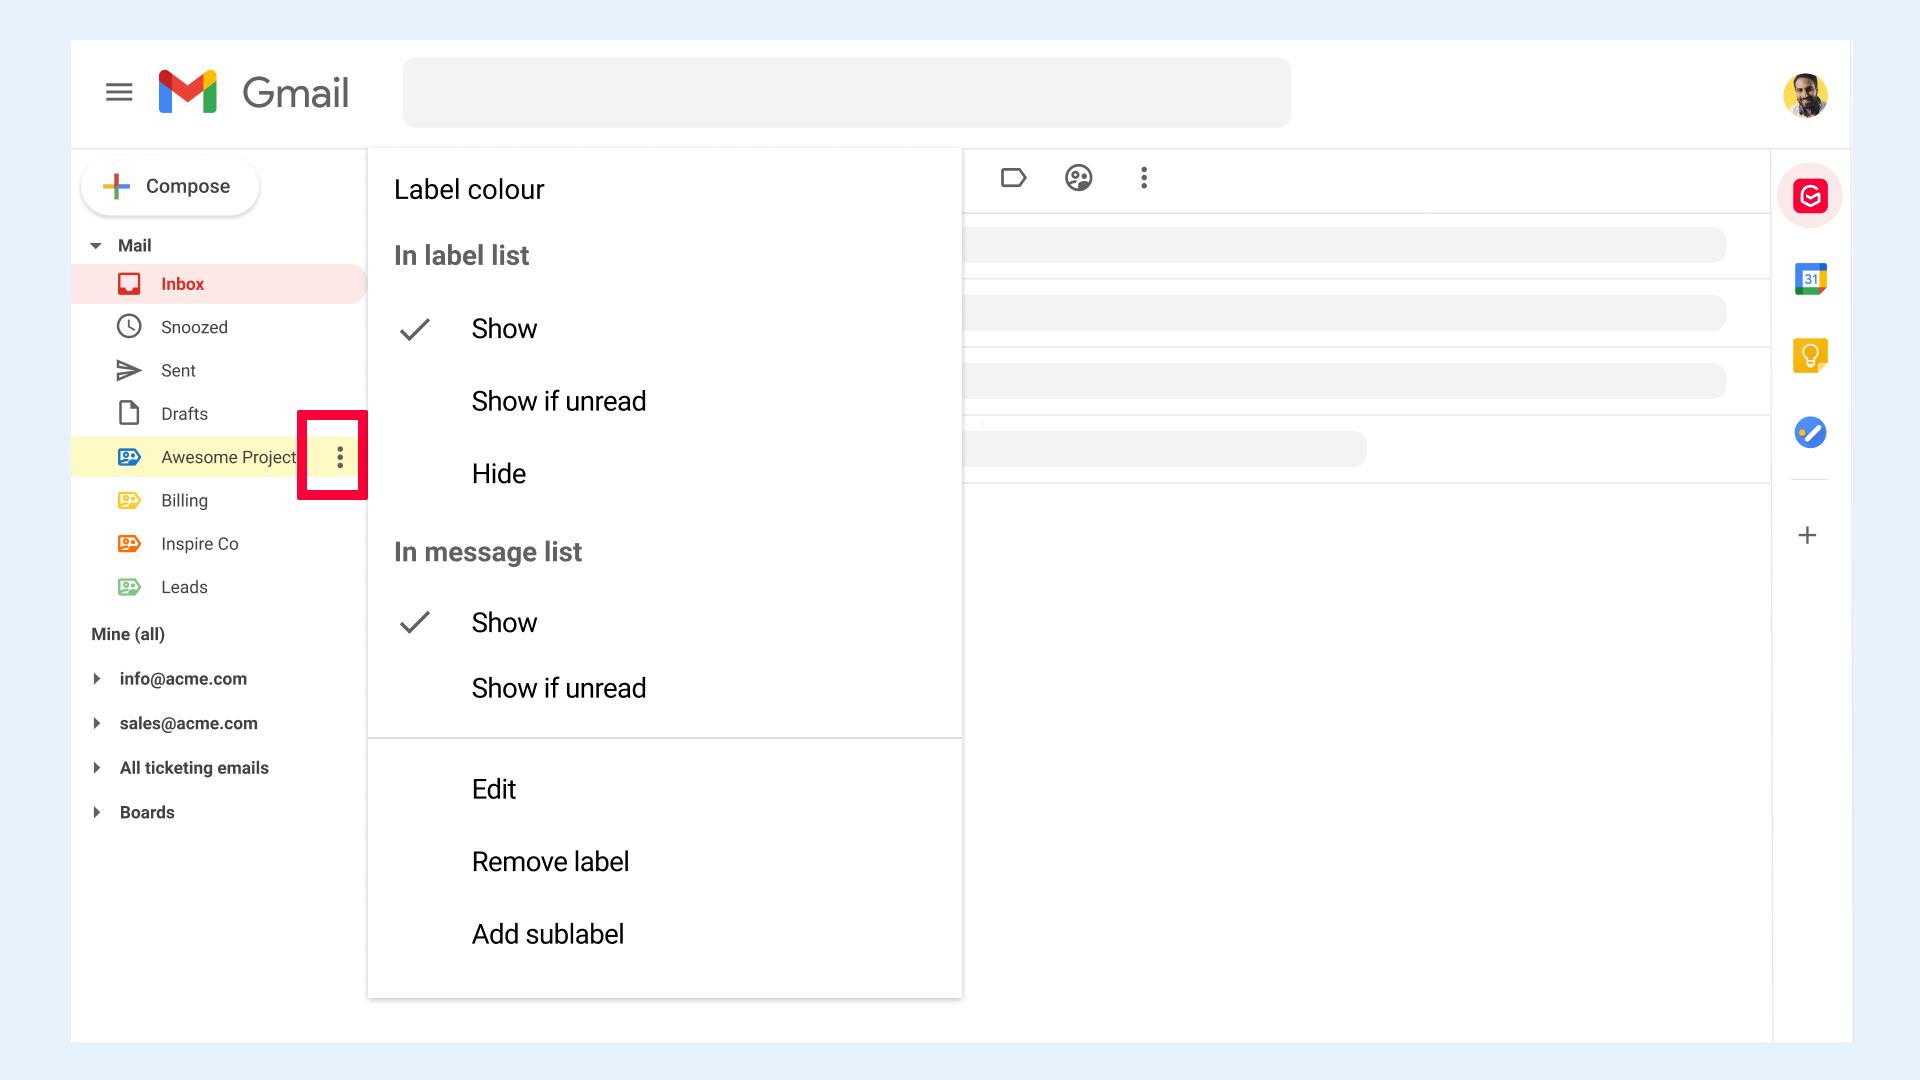 Edit label in Gmail